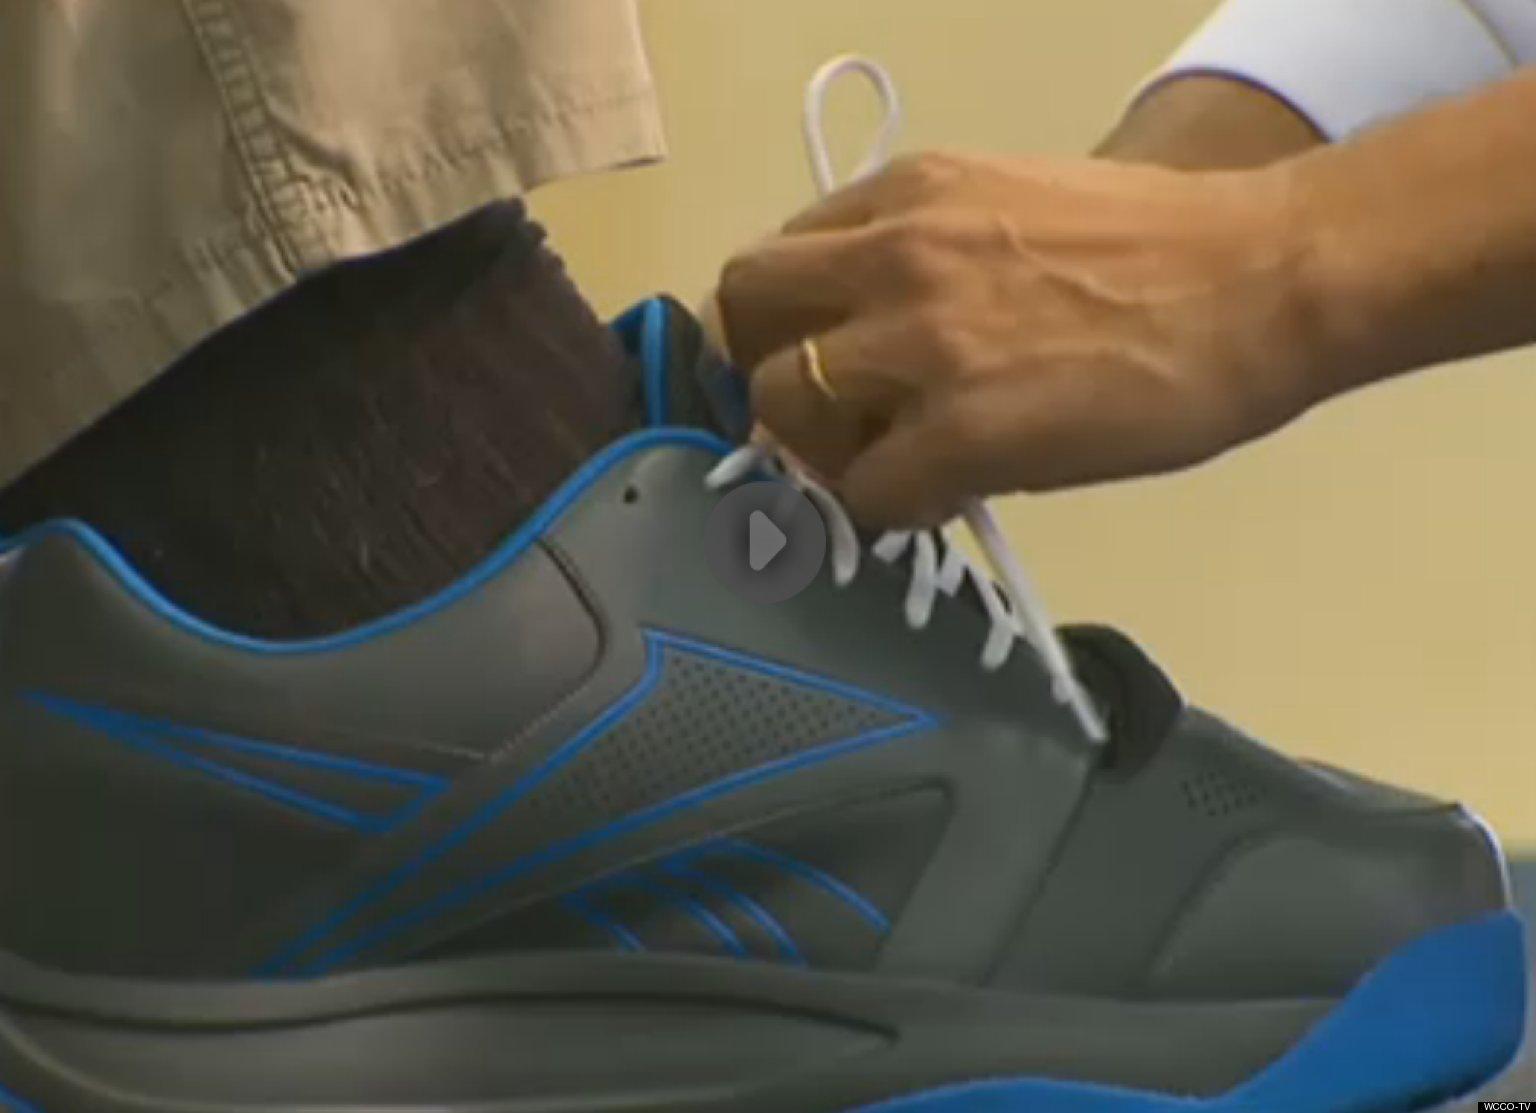 new nike air jordna 6 retro men shoes 24 white blue